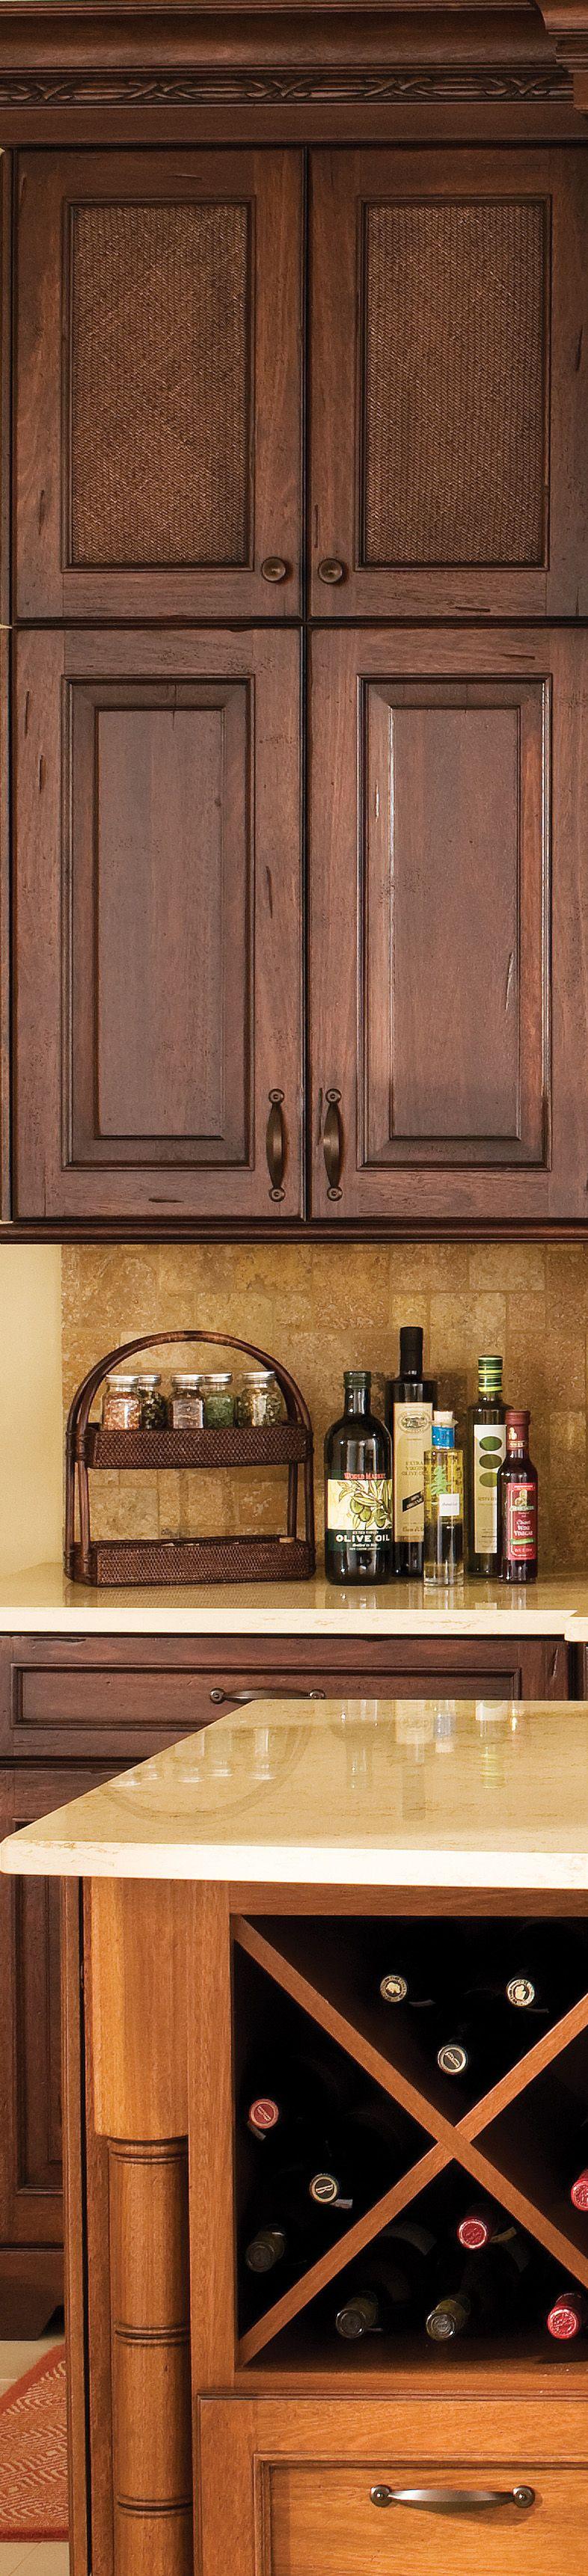 Get The Look How To Create A West Indies Style Kitchen Tropical Kitchen Kitchen Design Styles Kitchen Design Open